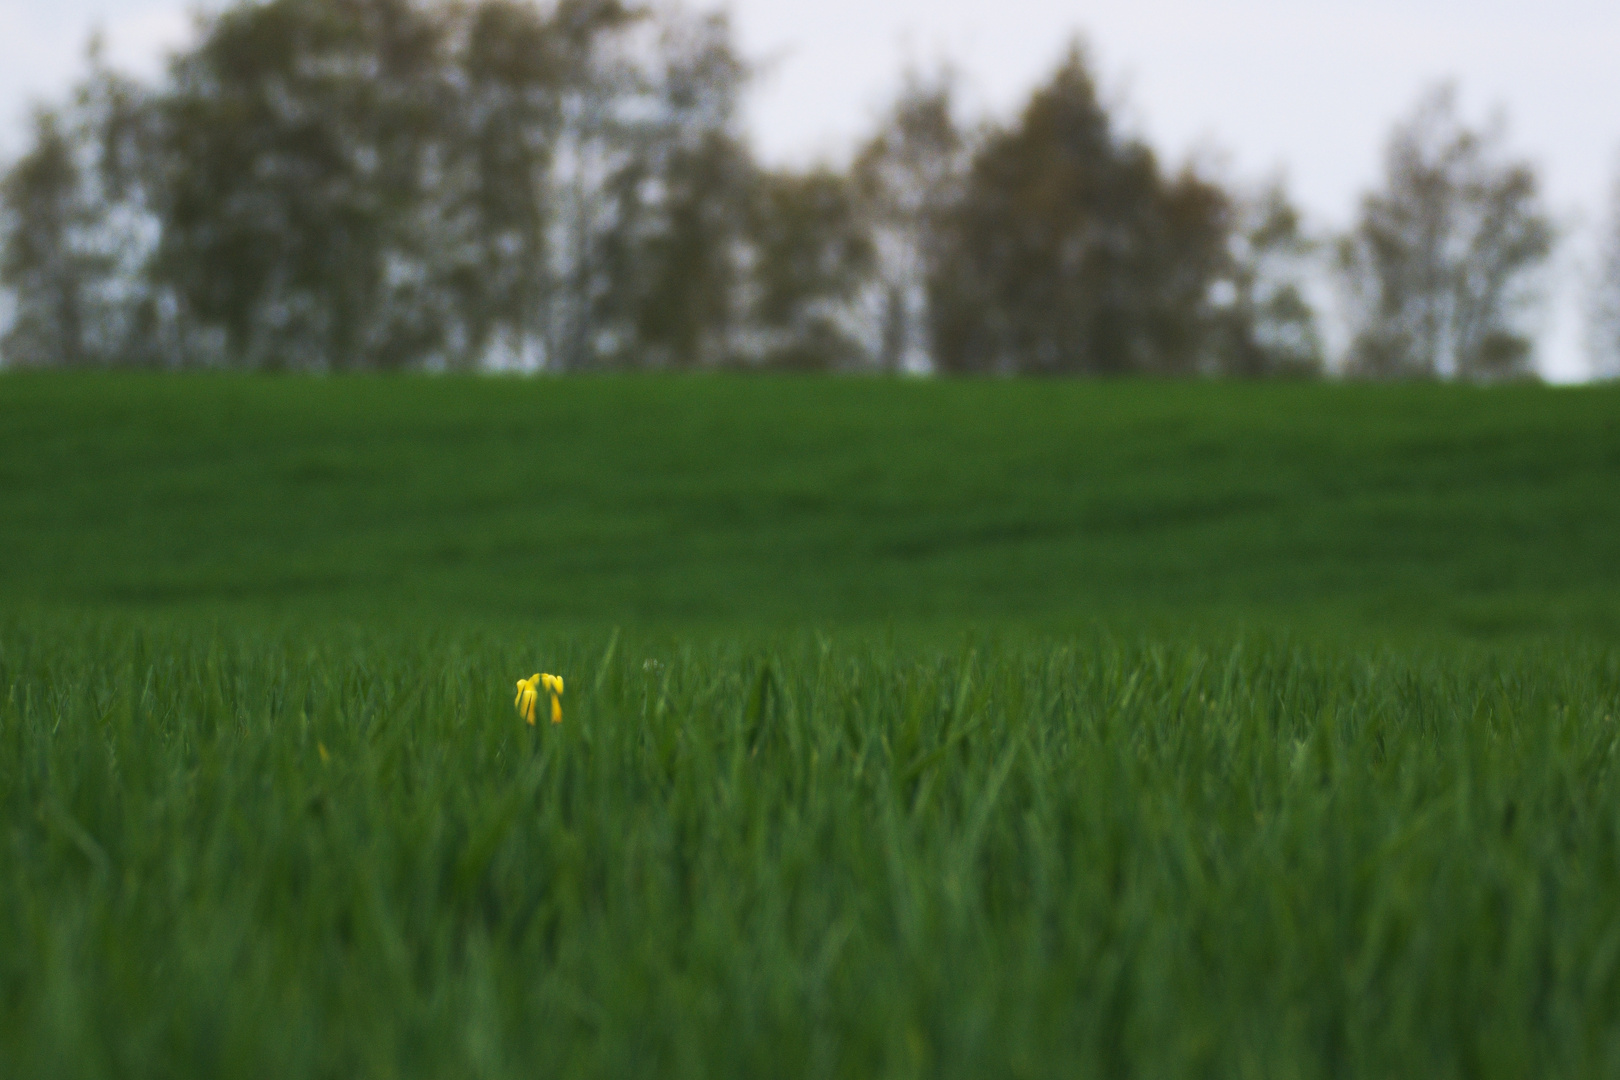 Eine Tulpe im Getreidefeld